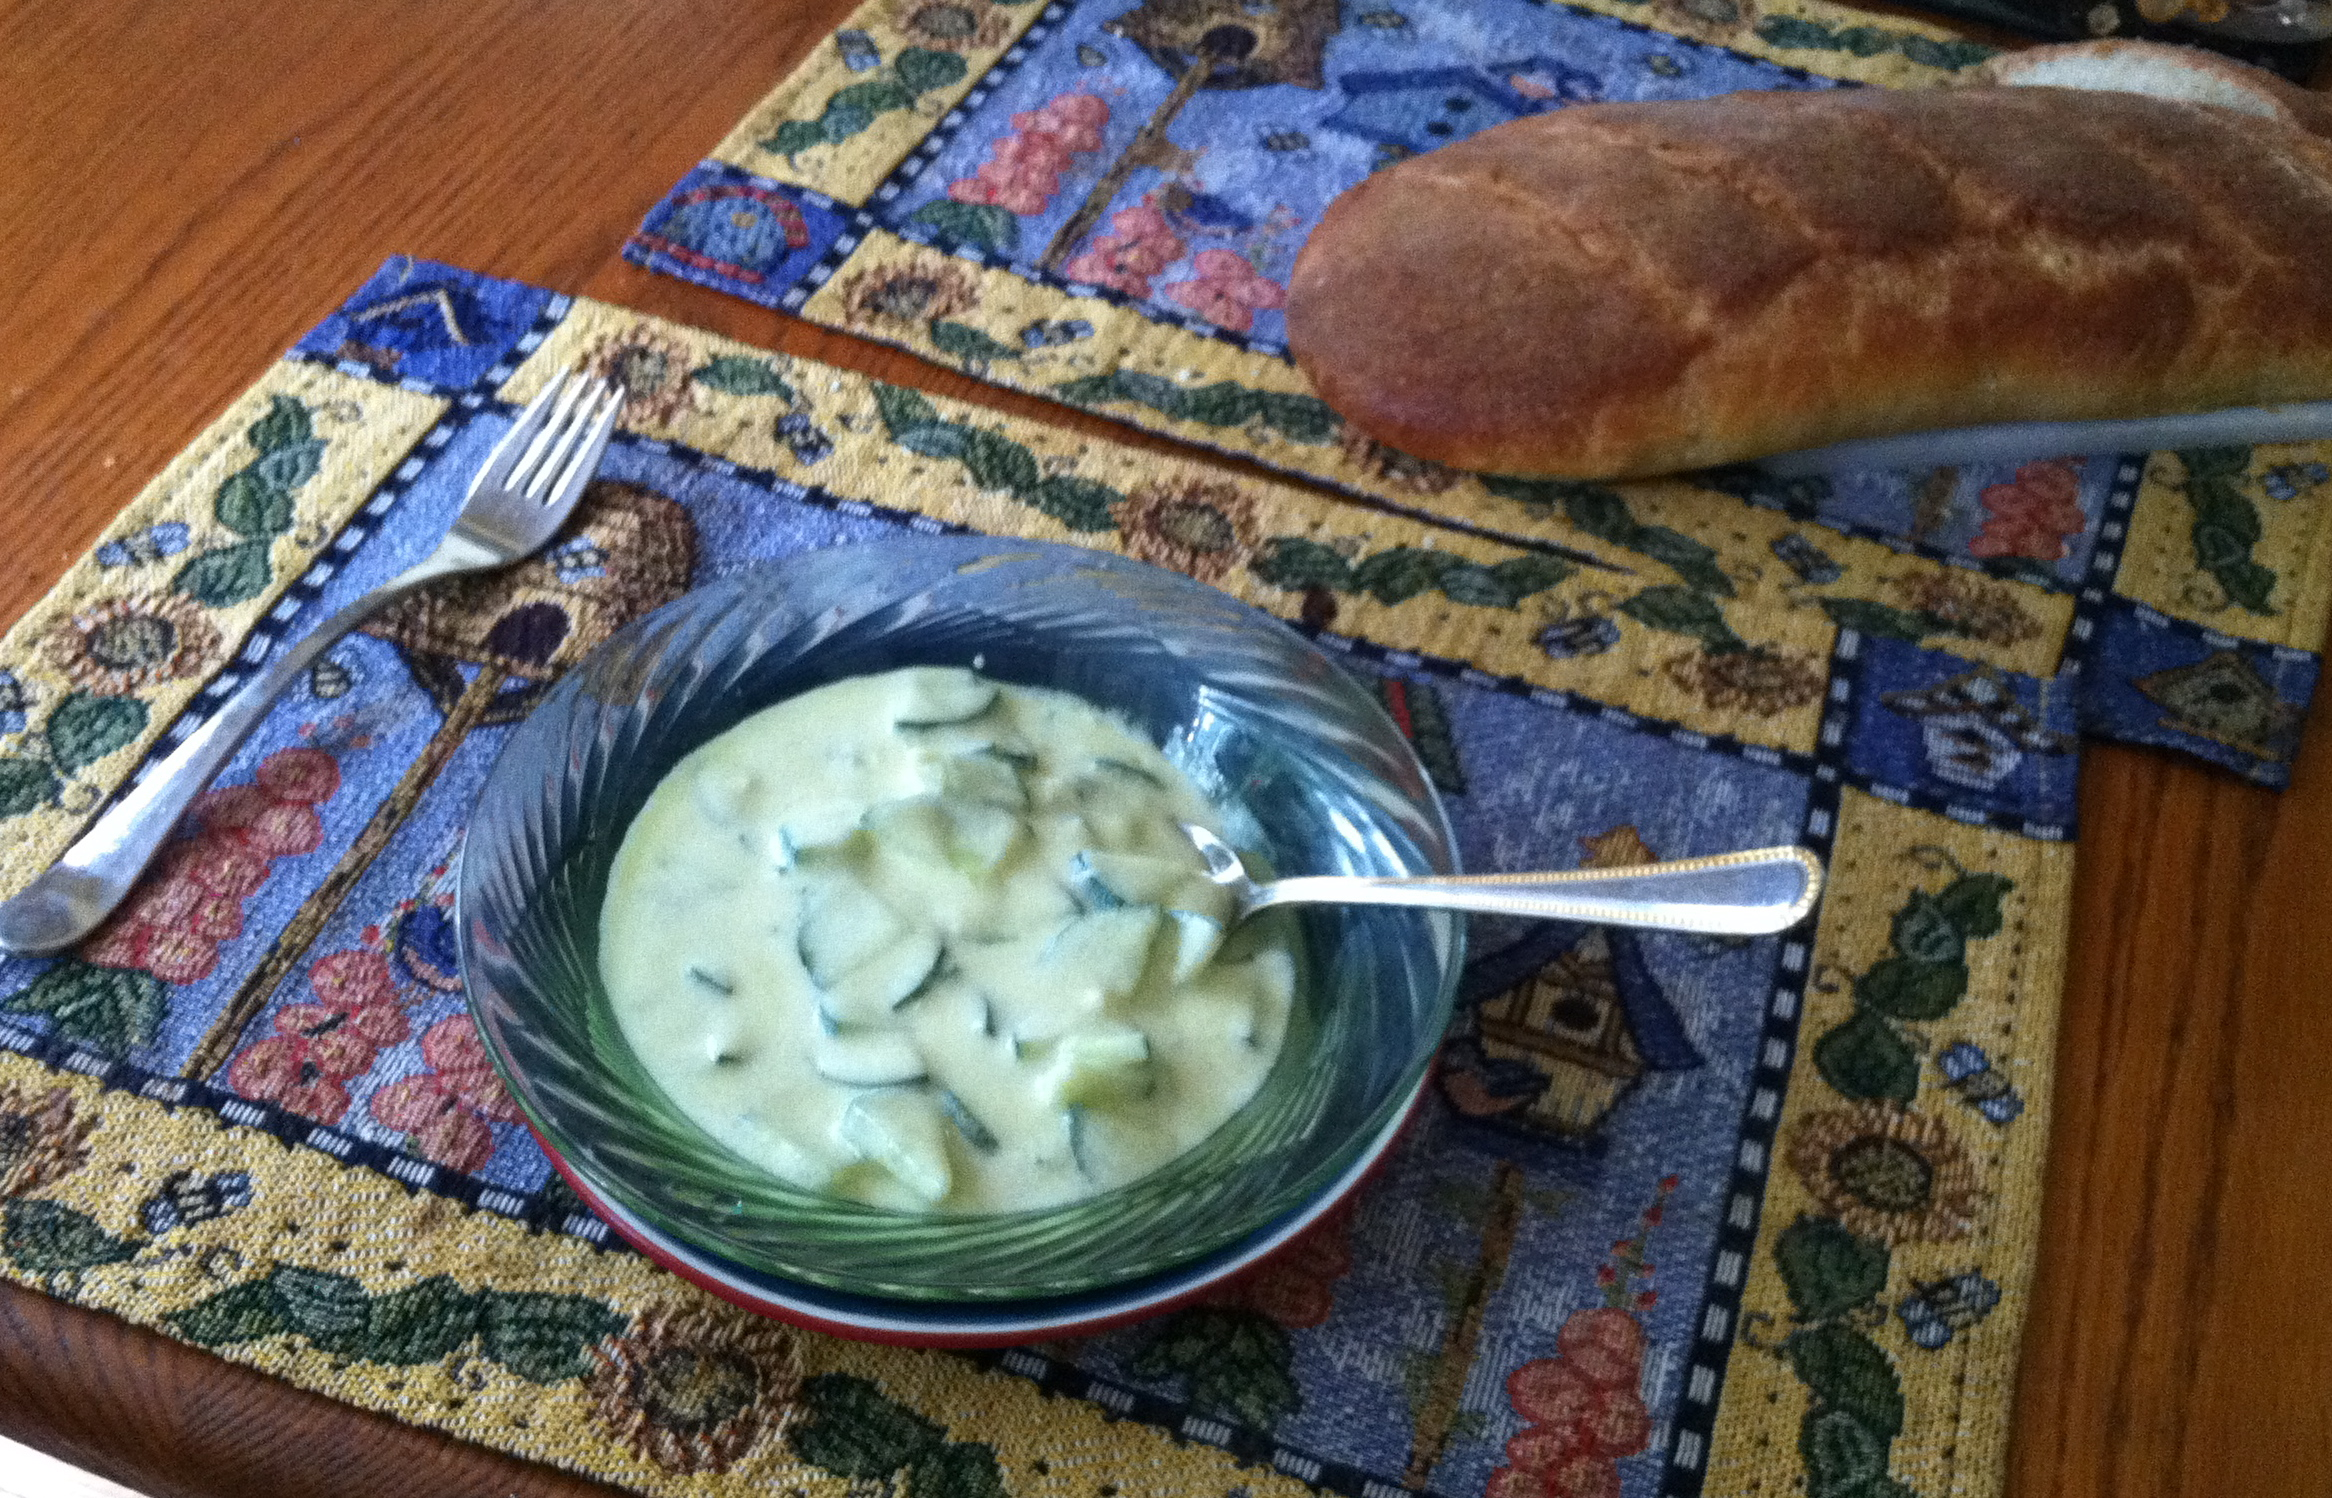 ... Salad Vegetable Salads Tzatziki (Greek Cucumber and Yogurt Salad